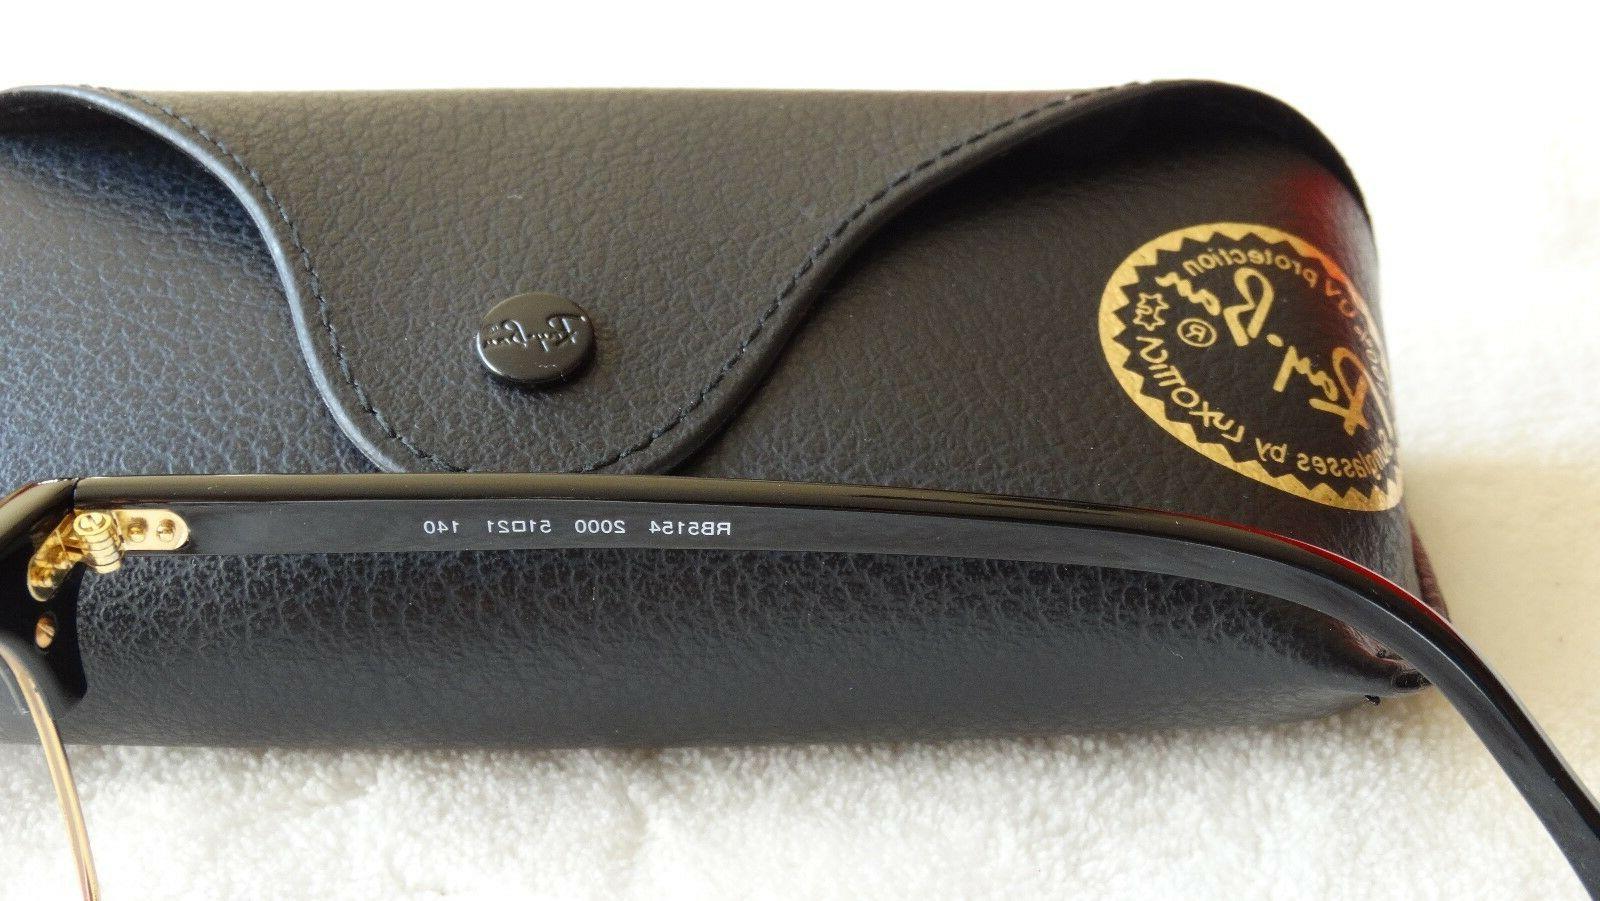 BRAND NEW! RB 5154 2000 EYEGLASSES SIZE GOLD